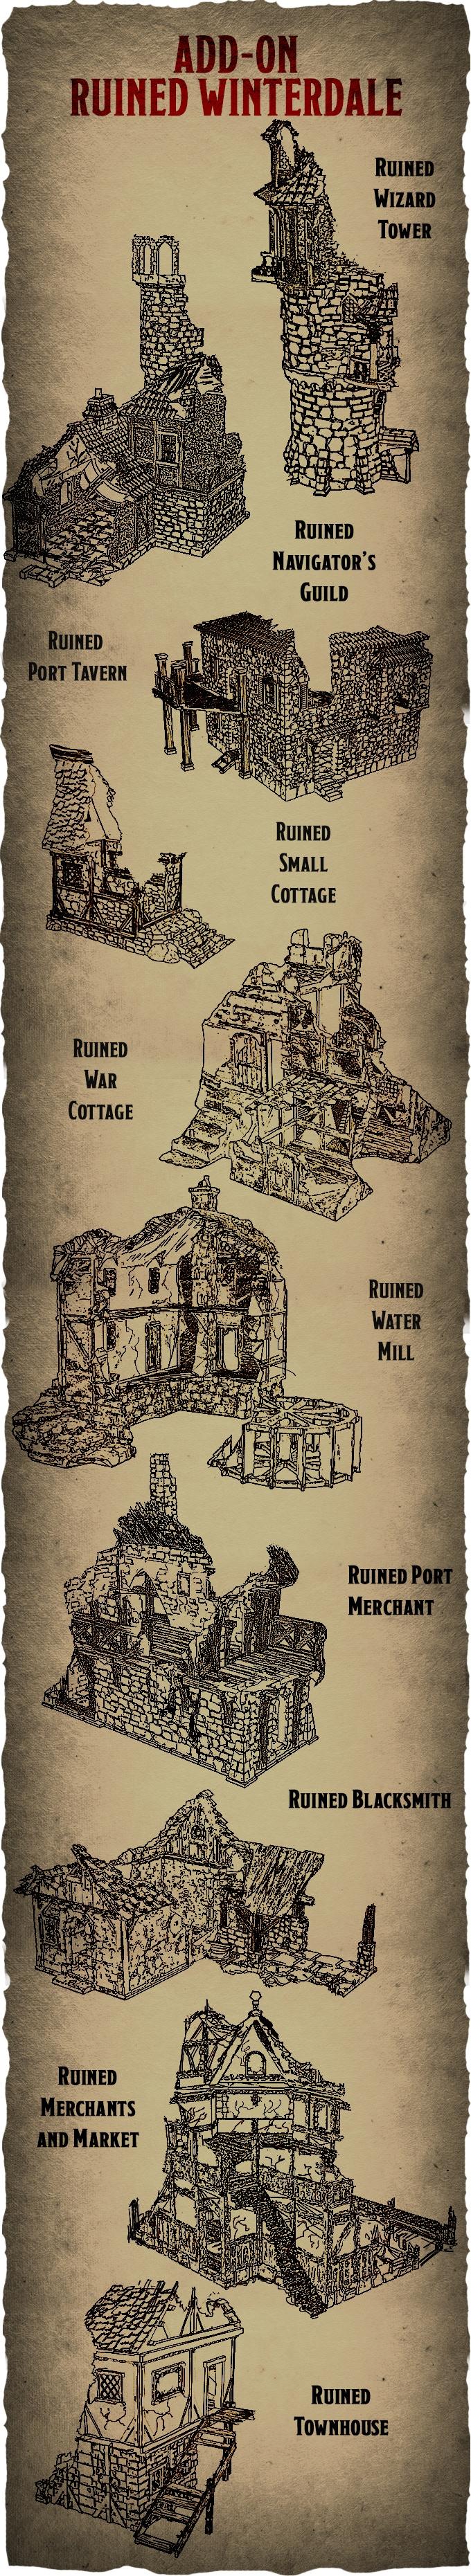 Dwarves, Elves and Demons by Printable Scenery — Kickstarter